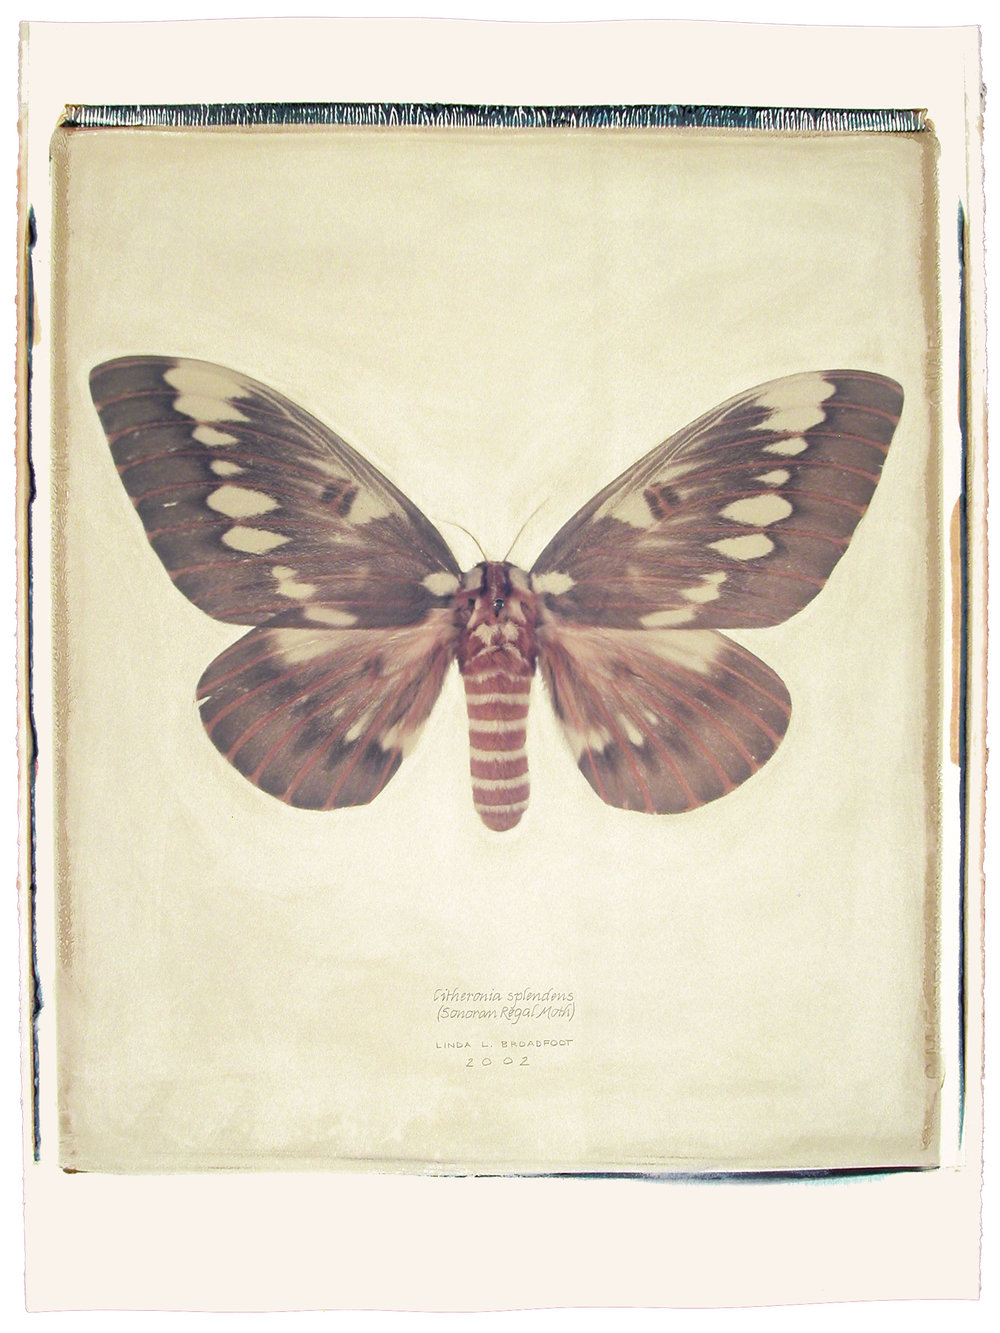 Citheronia splendens  (Sonoran Regal Moth), 2002